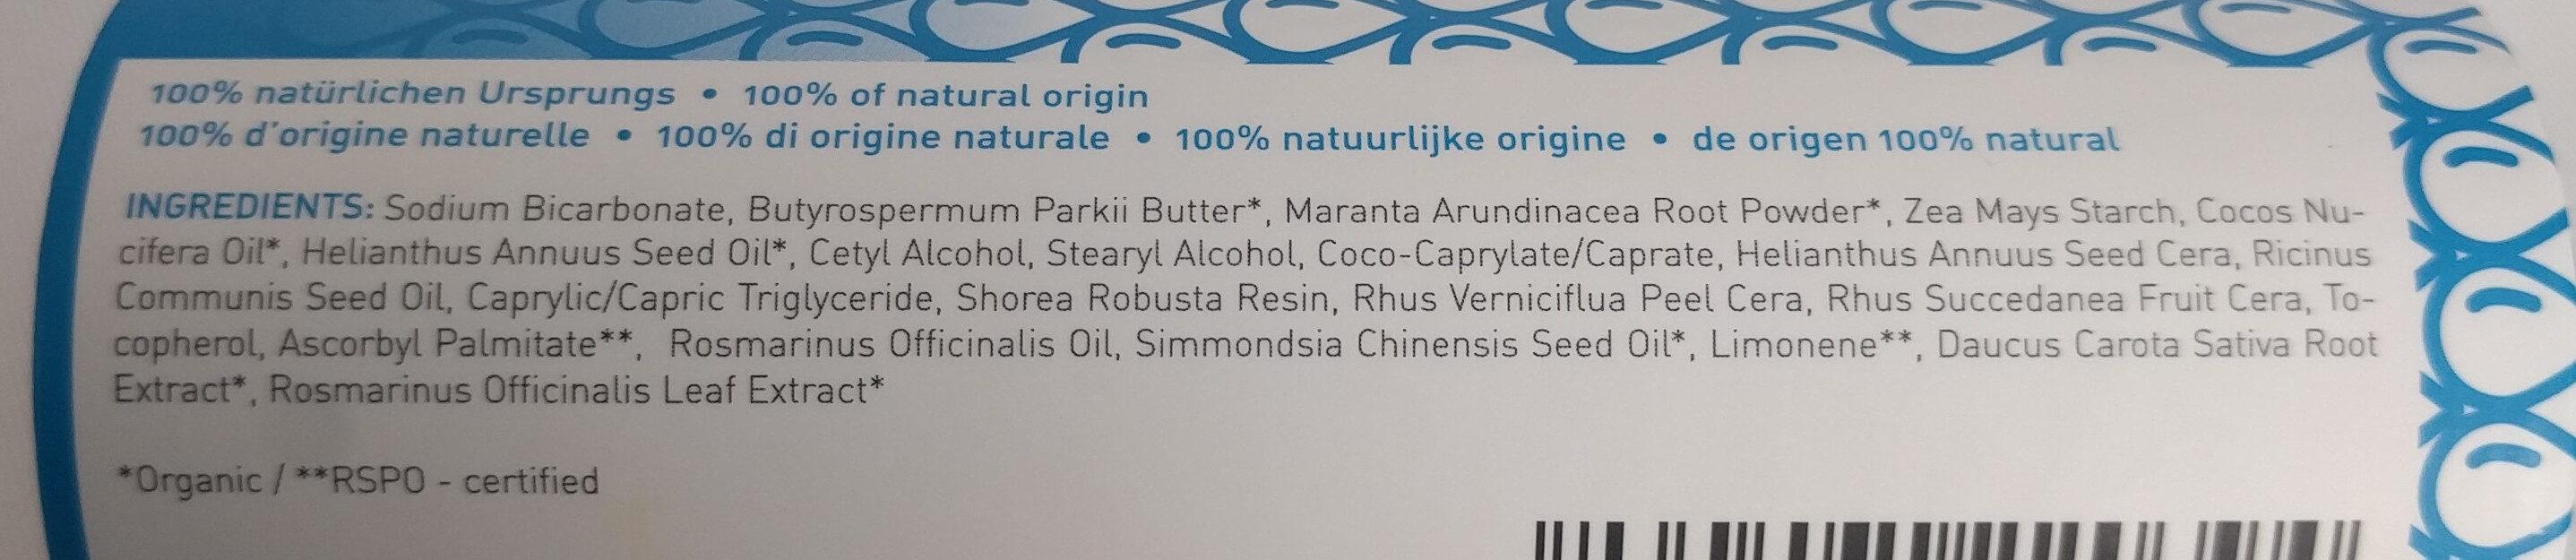 Natural Deodorant PURE - Ingredients - de